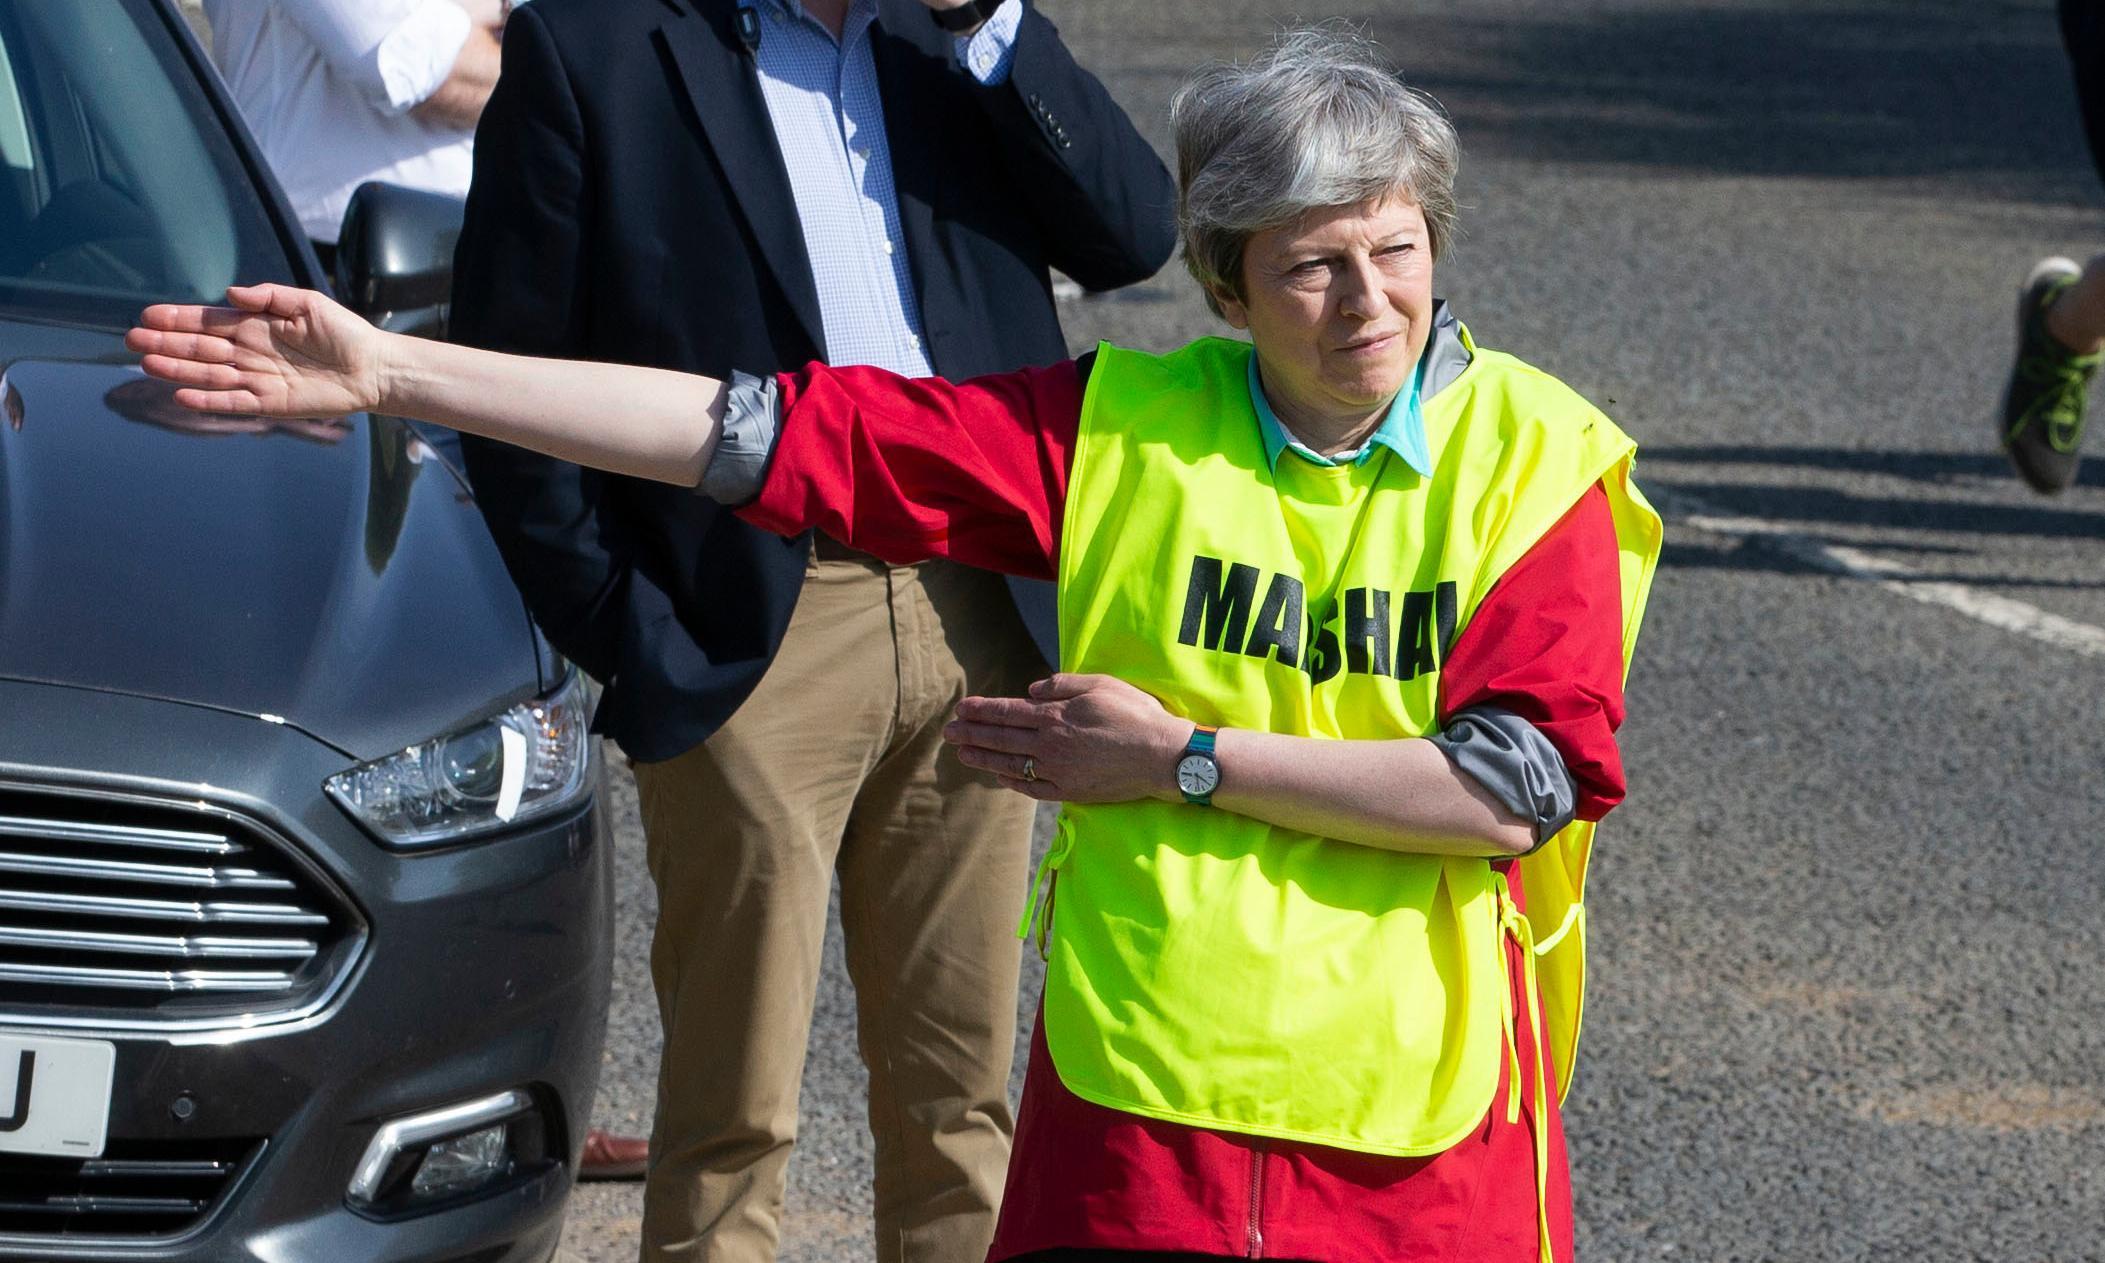 MPs may vote on key Brexit legislation next week